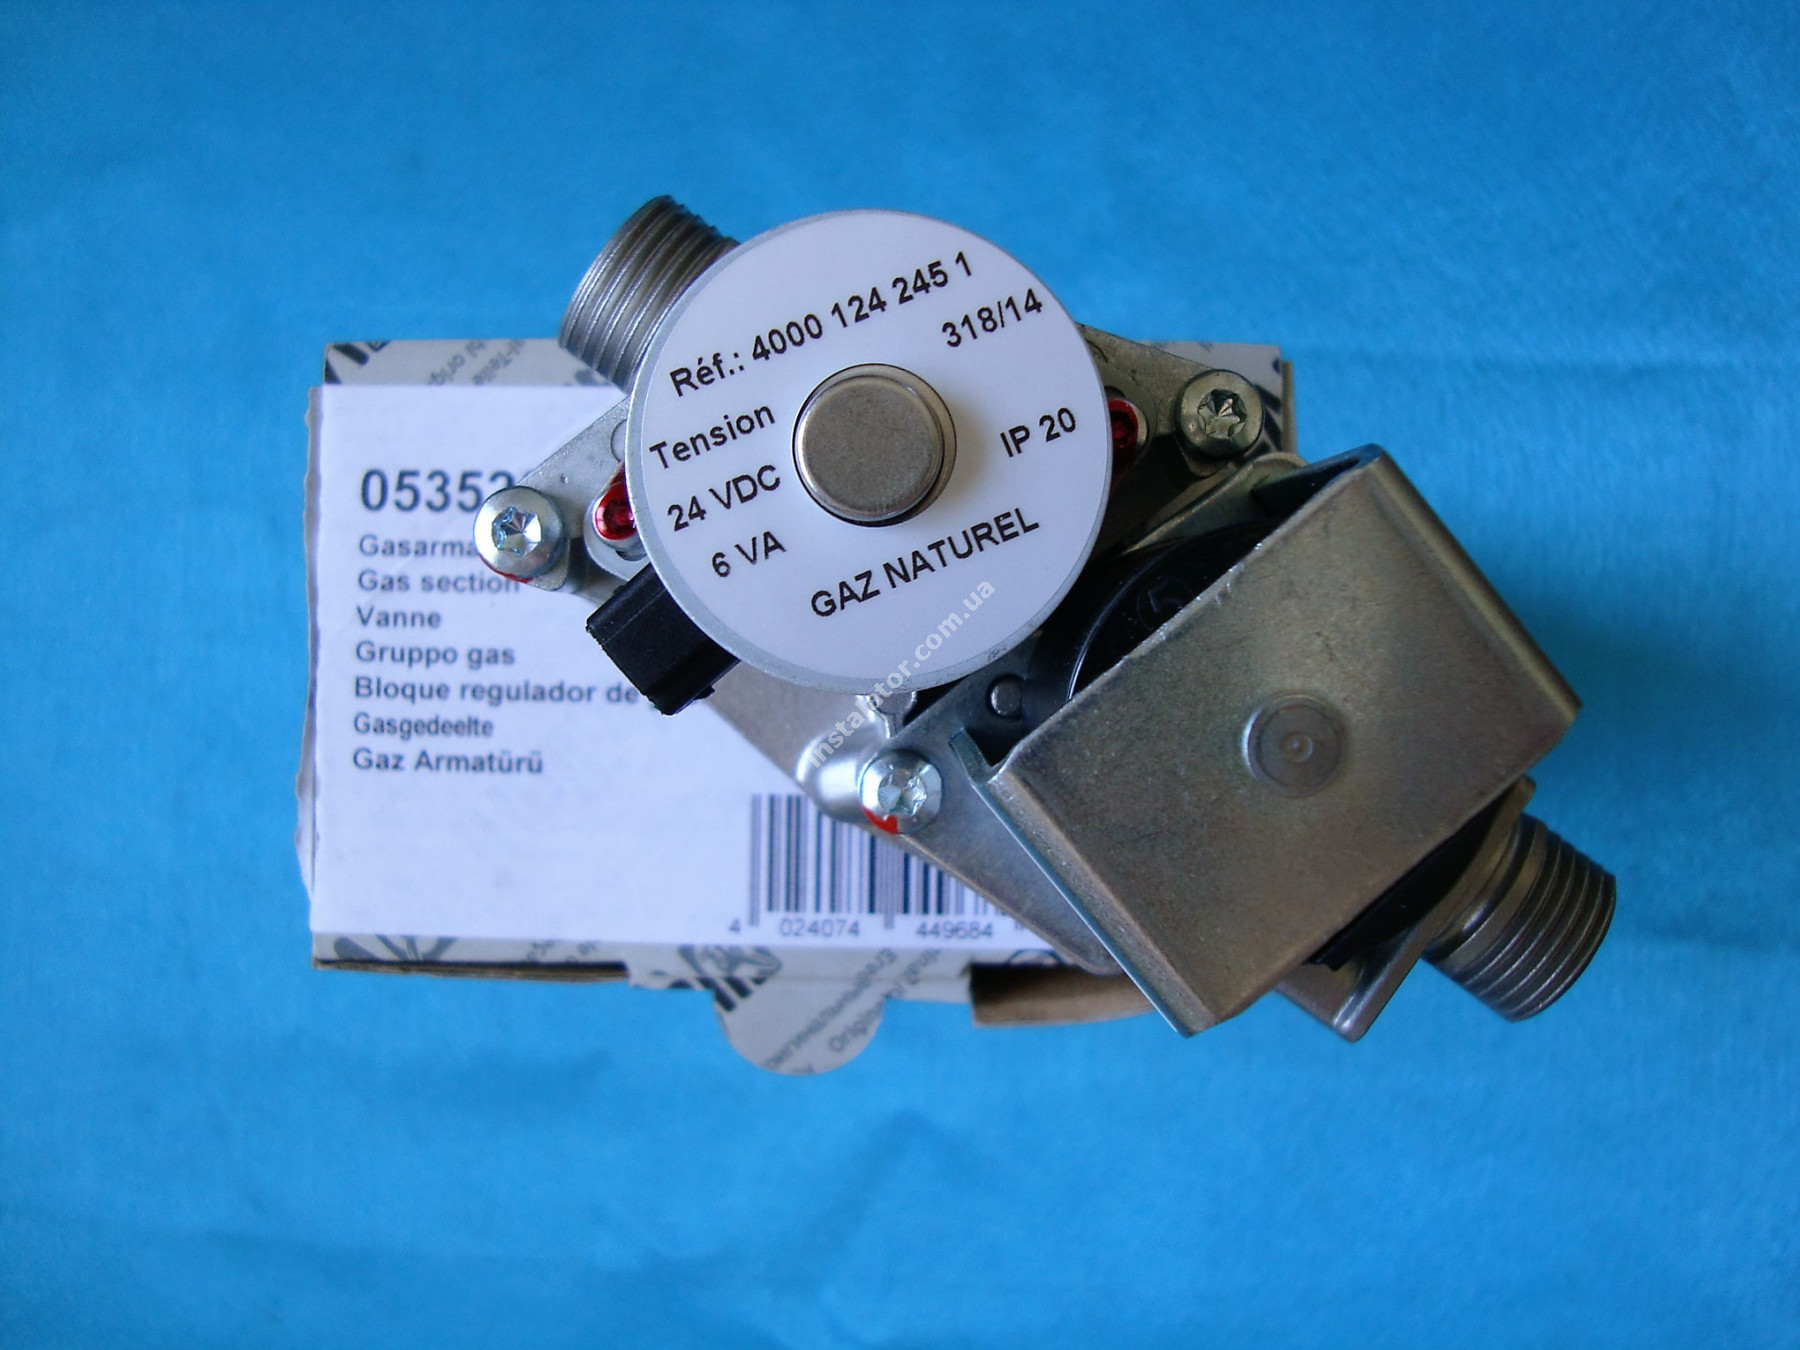 053520 Газовий клапан колонки VAILLANT MAG 16-0/0 XEA G20 (HONEYWELL CE-1312BM354) full-image-3